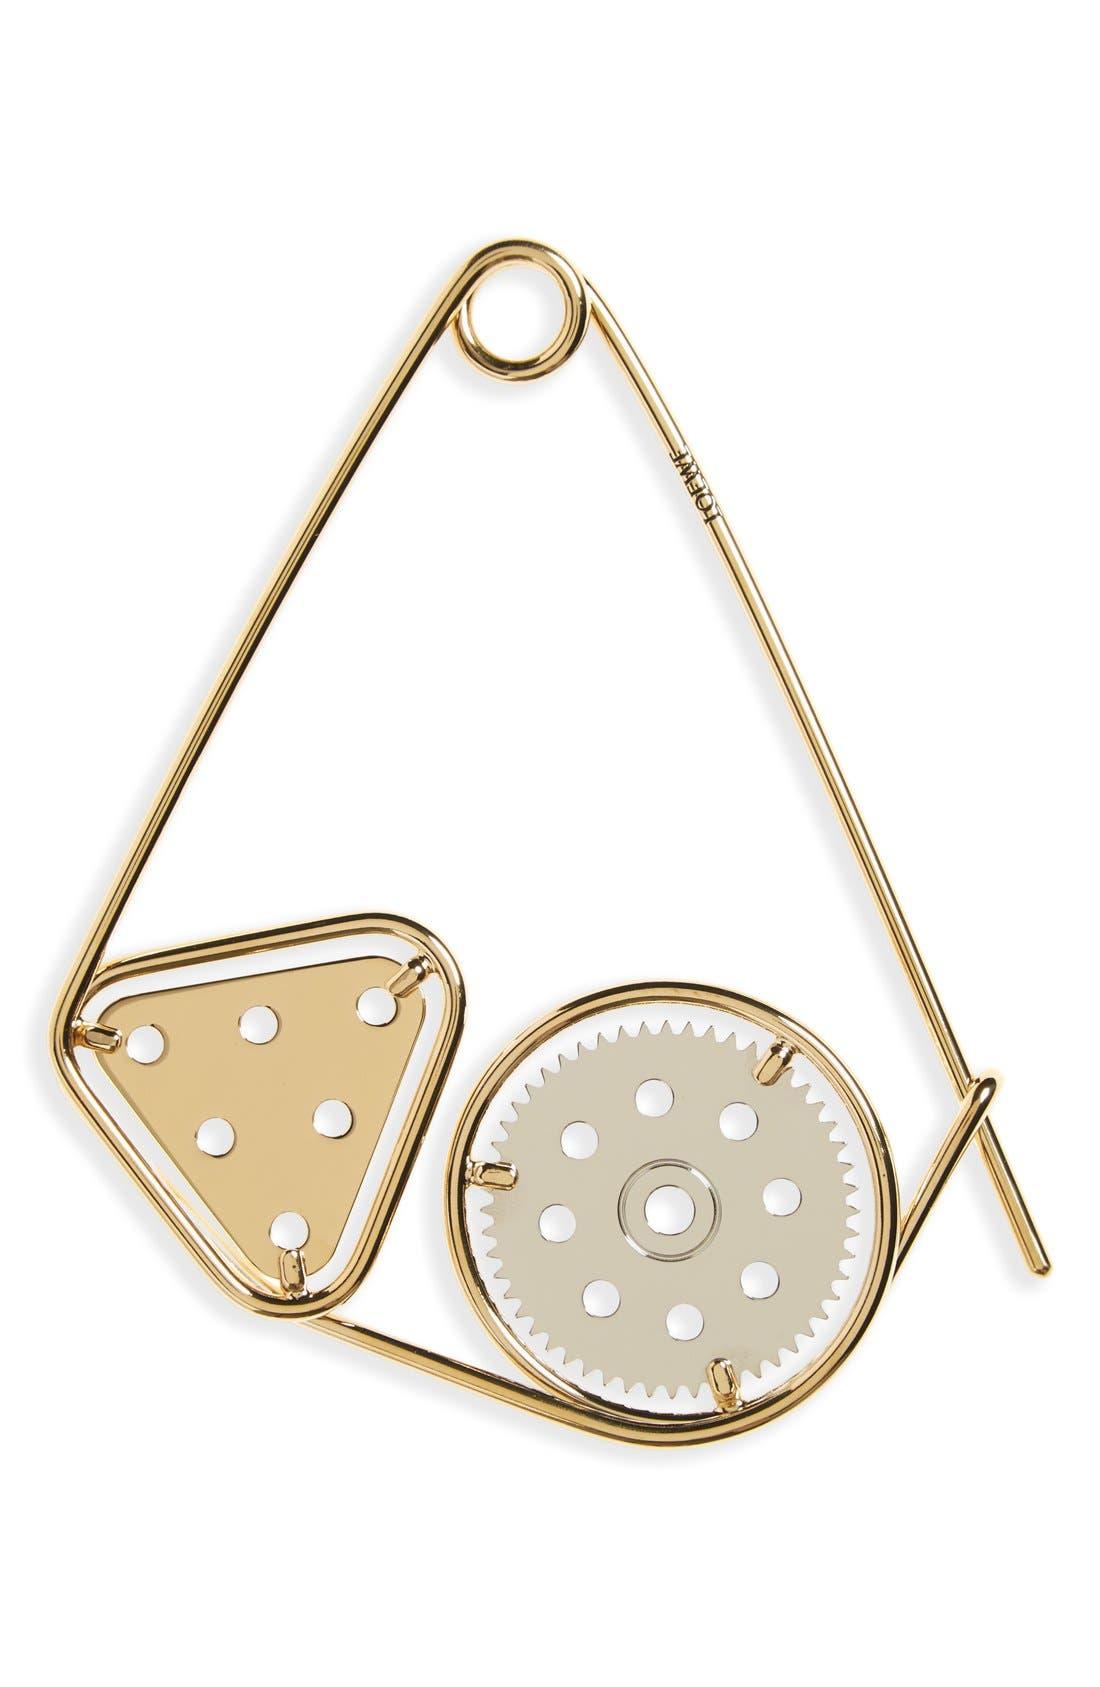 LOEWE Meccano Double Pin Bag Charm